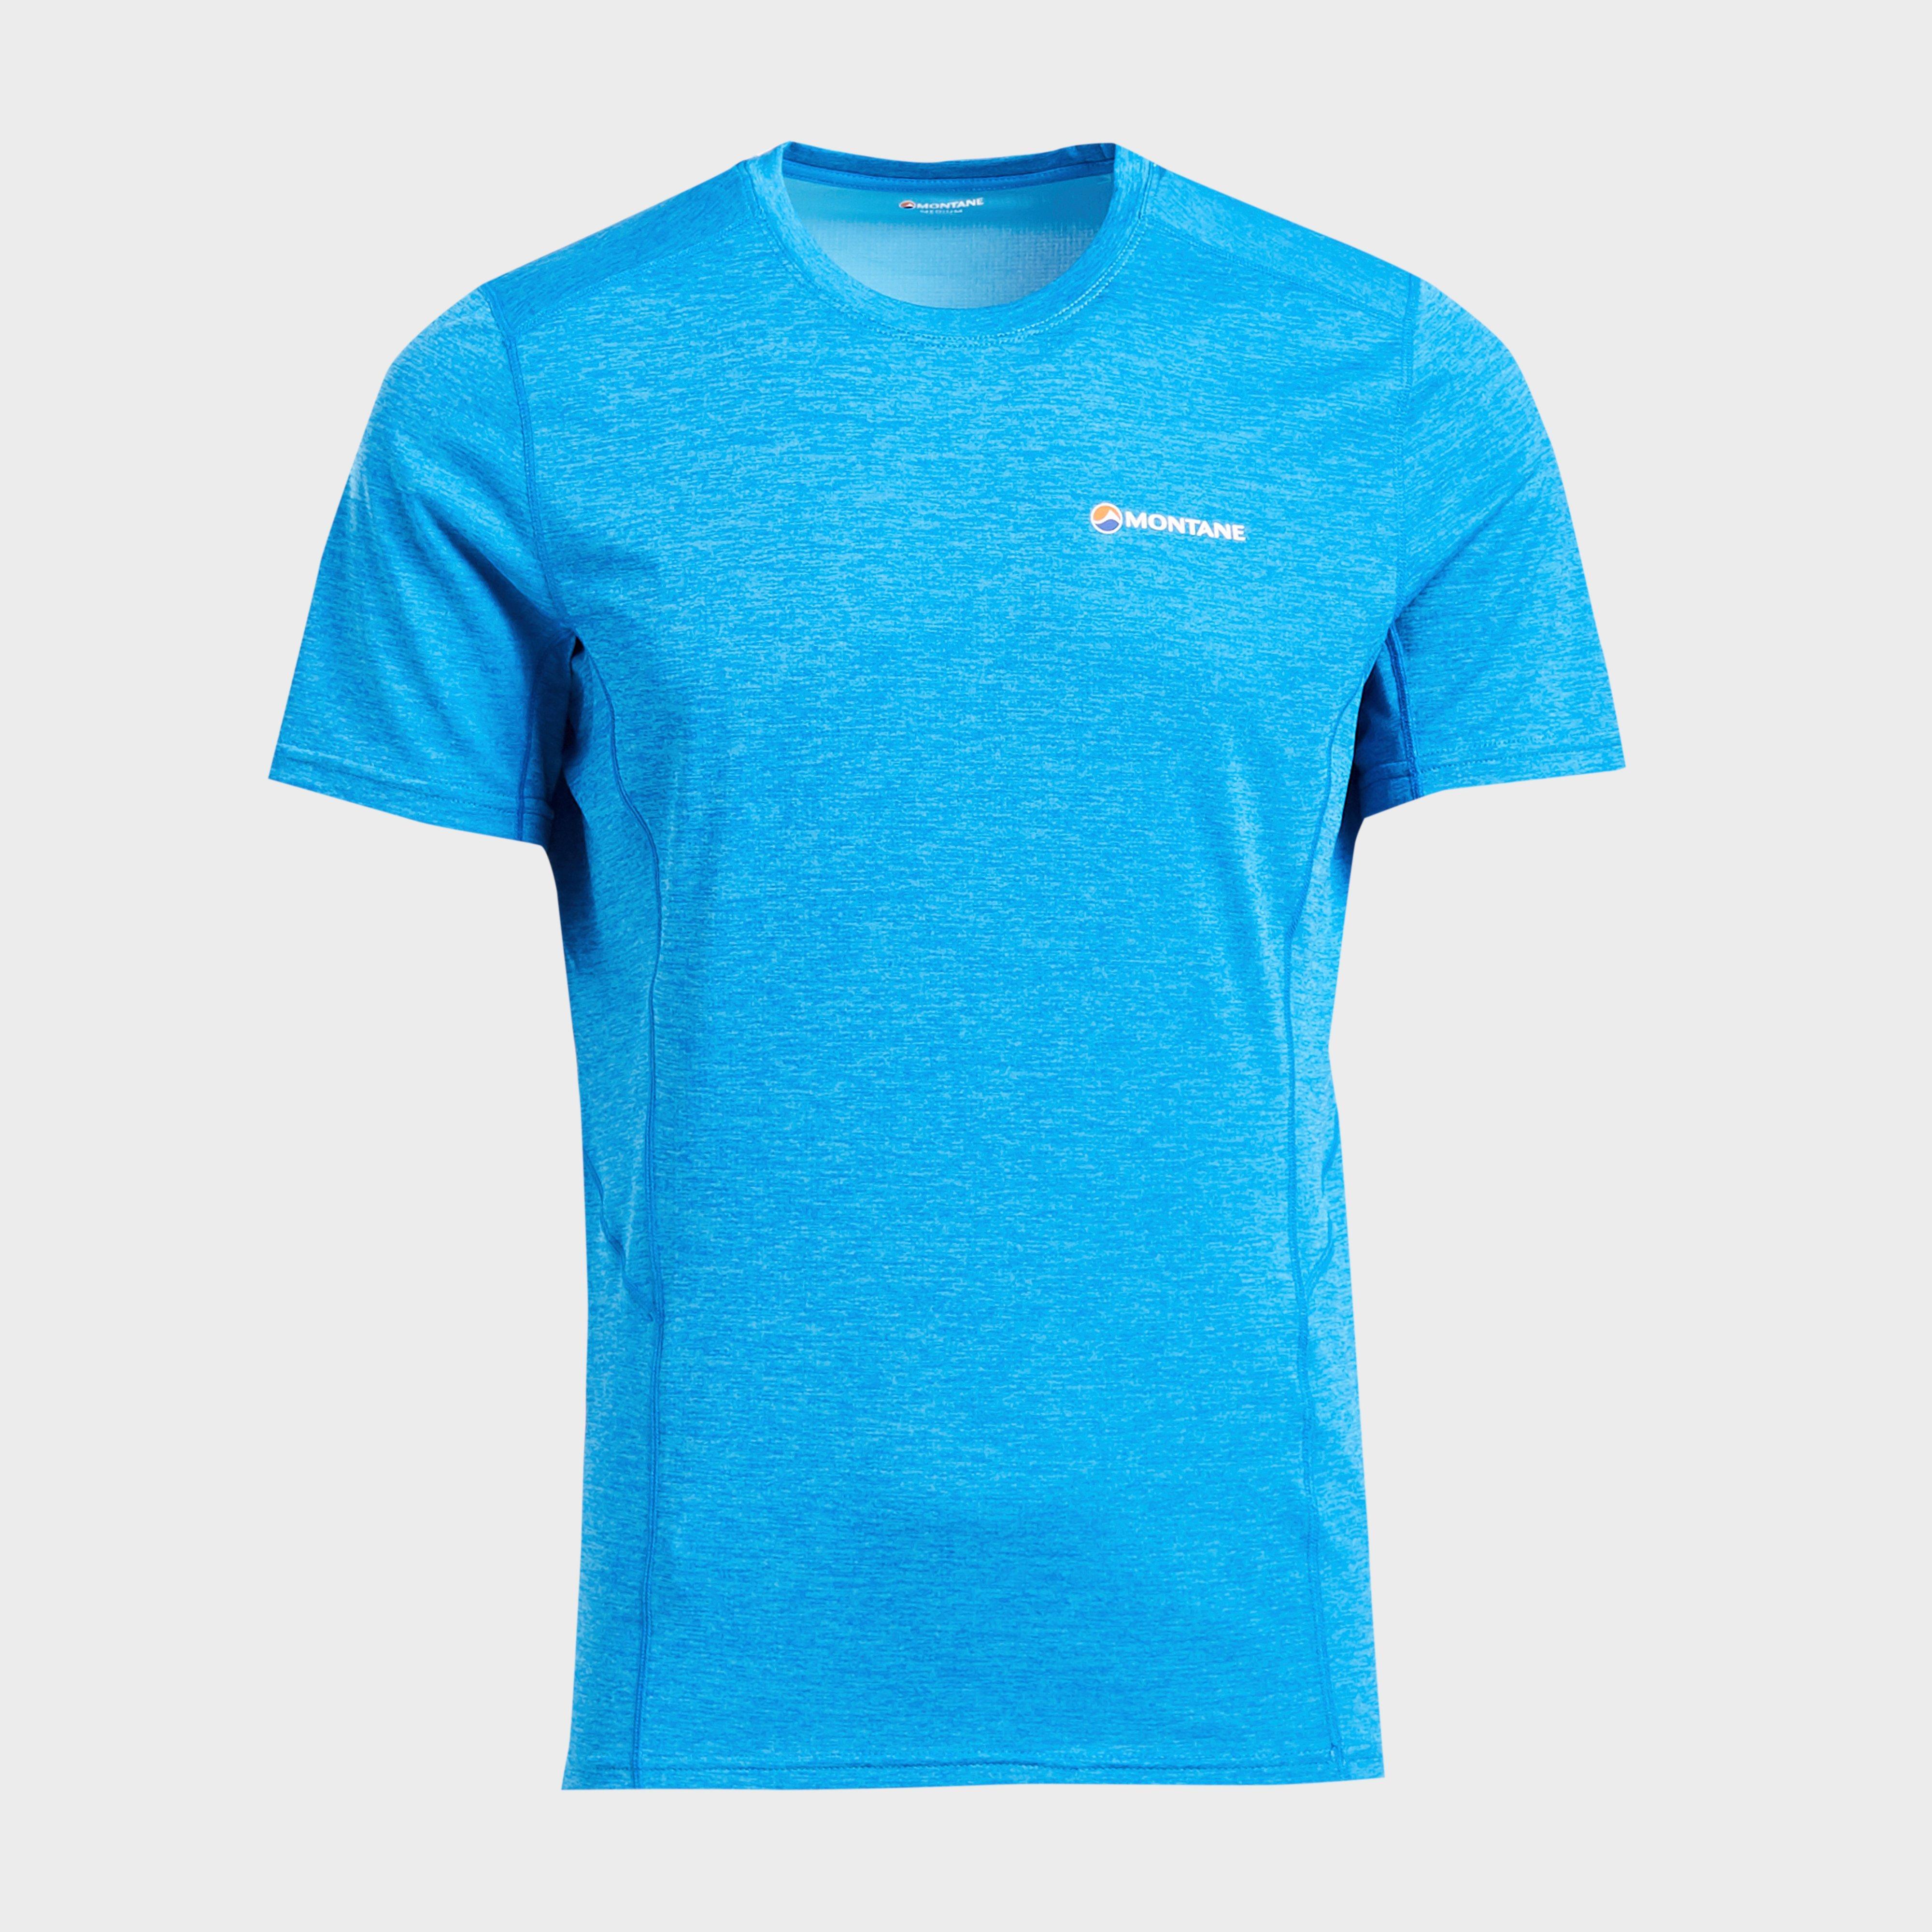 Montane Montane Mens Dart T-Shirt - Blue, Blue